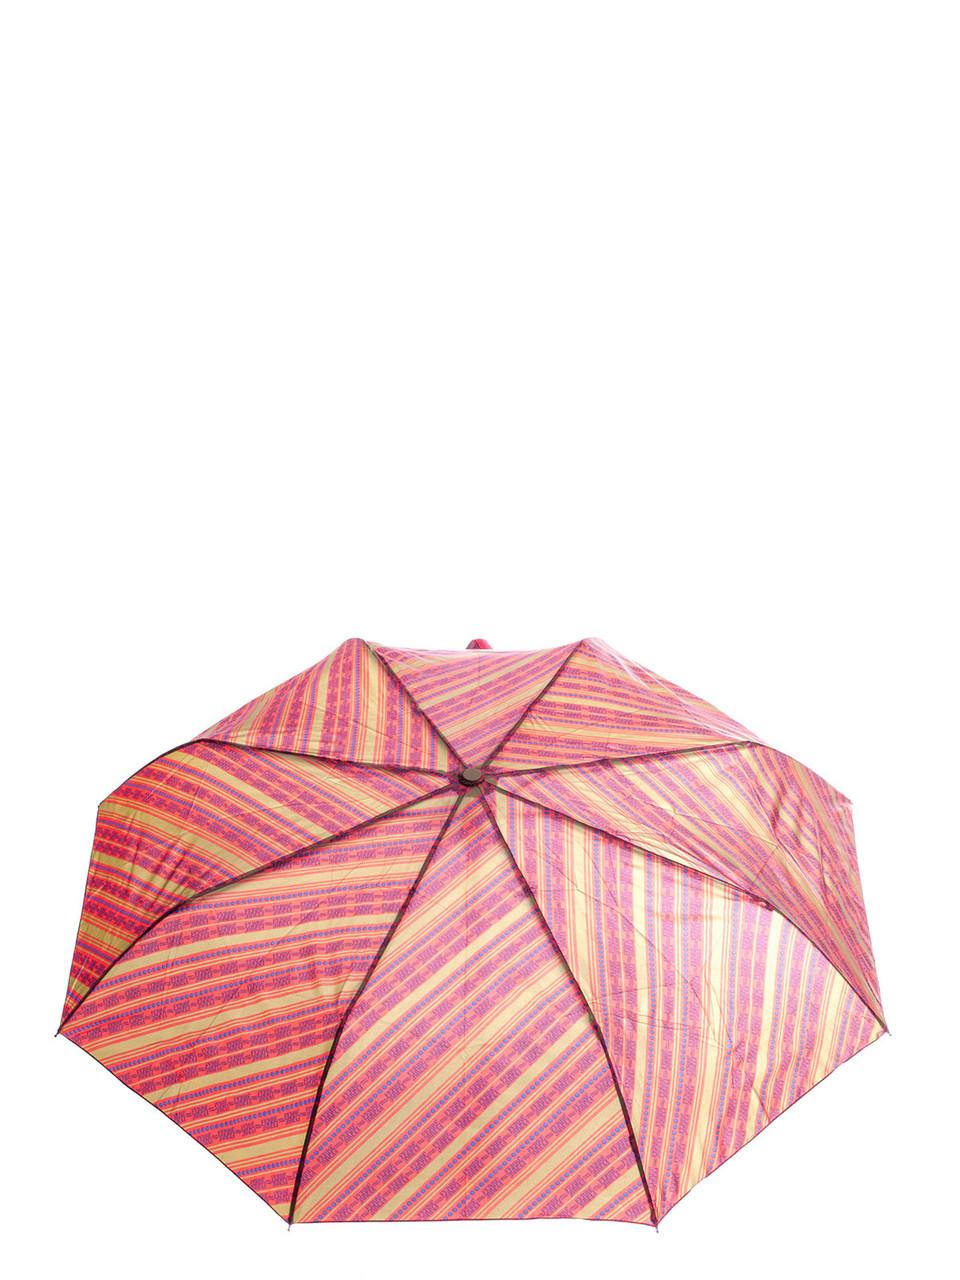 Зонт-полуавтомат Gianfranco Ferre GR-1_23